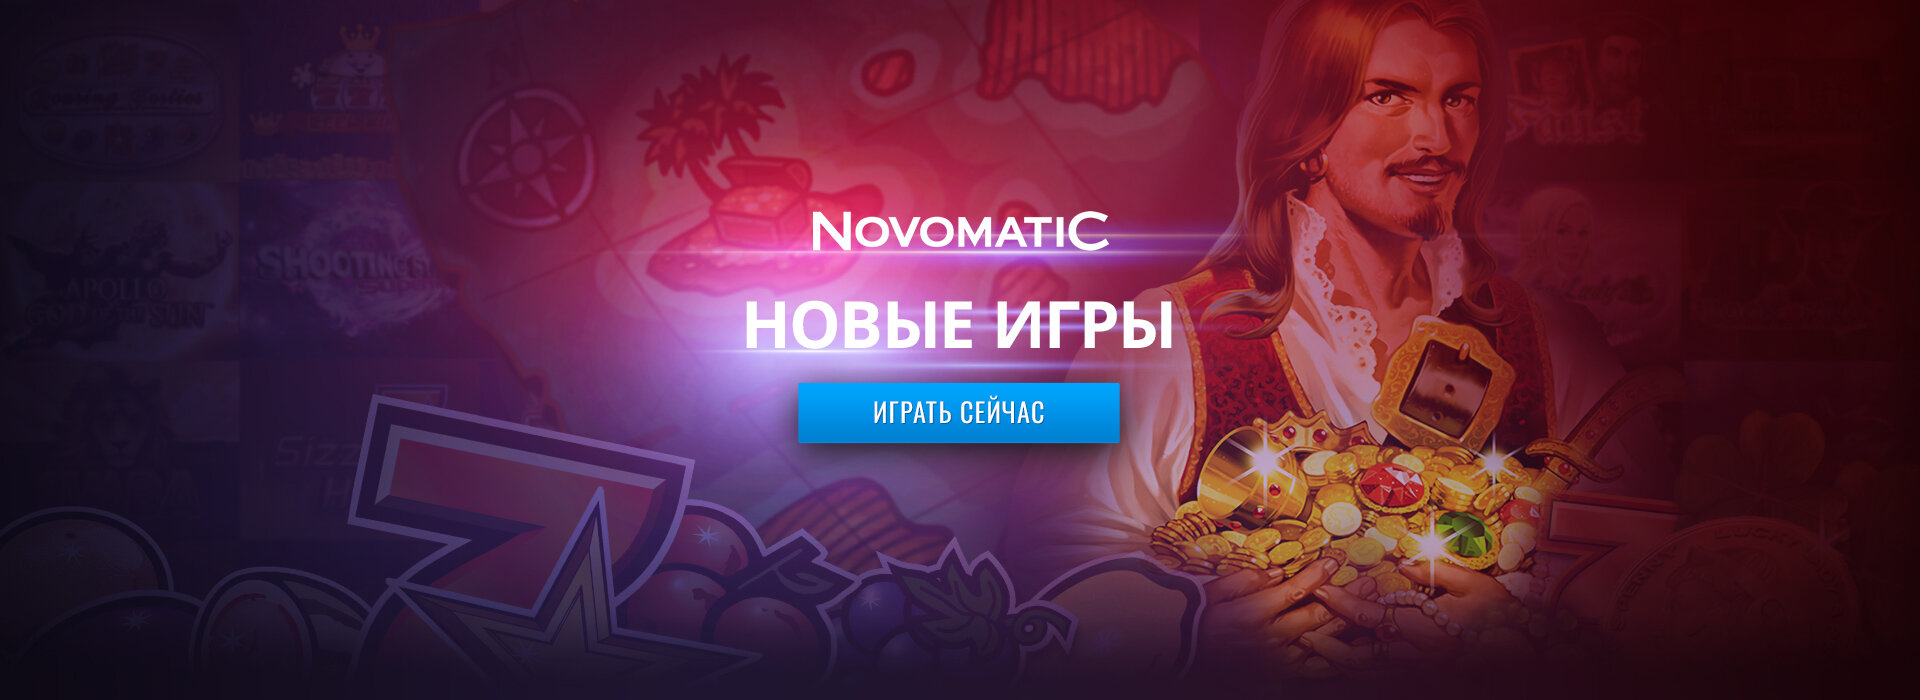 Novamatic RU